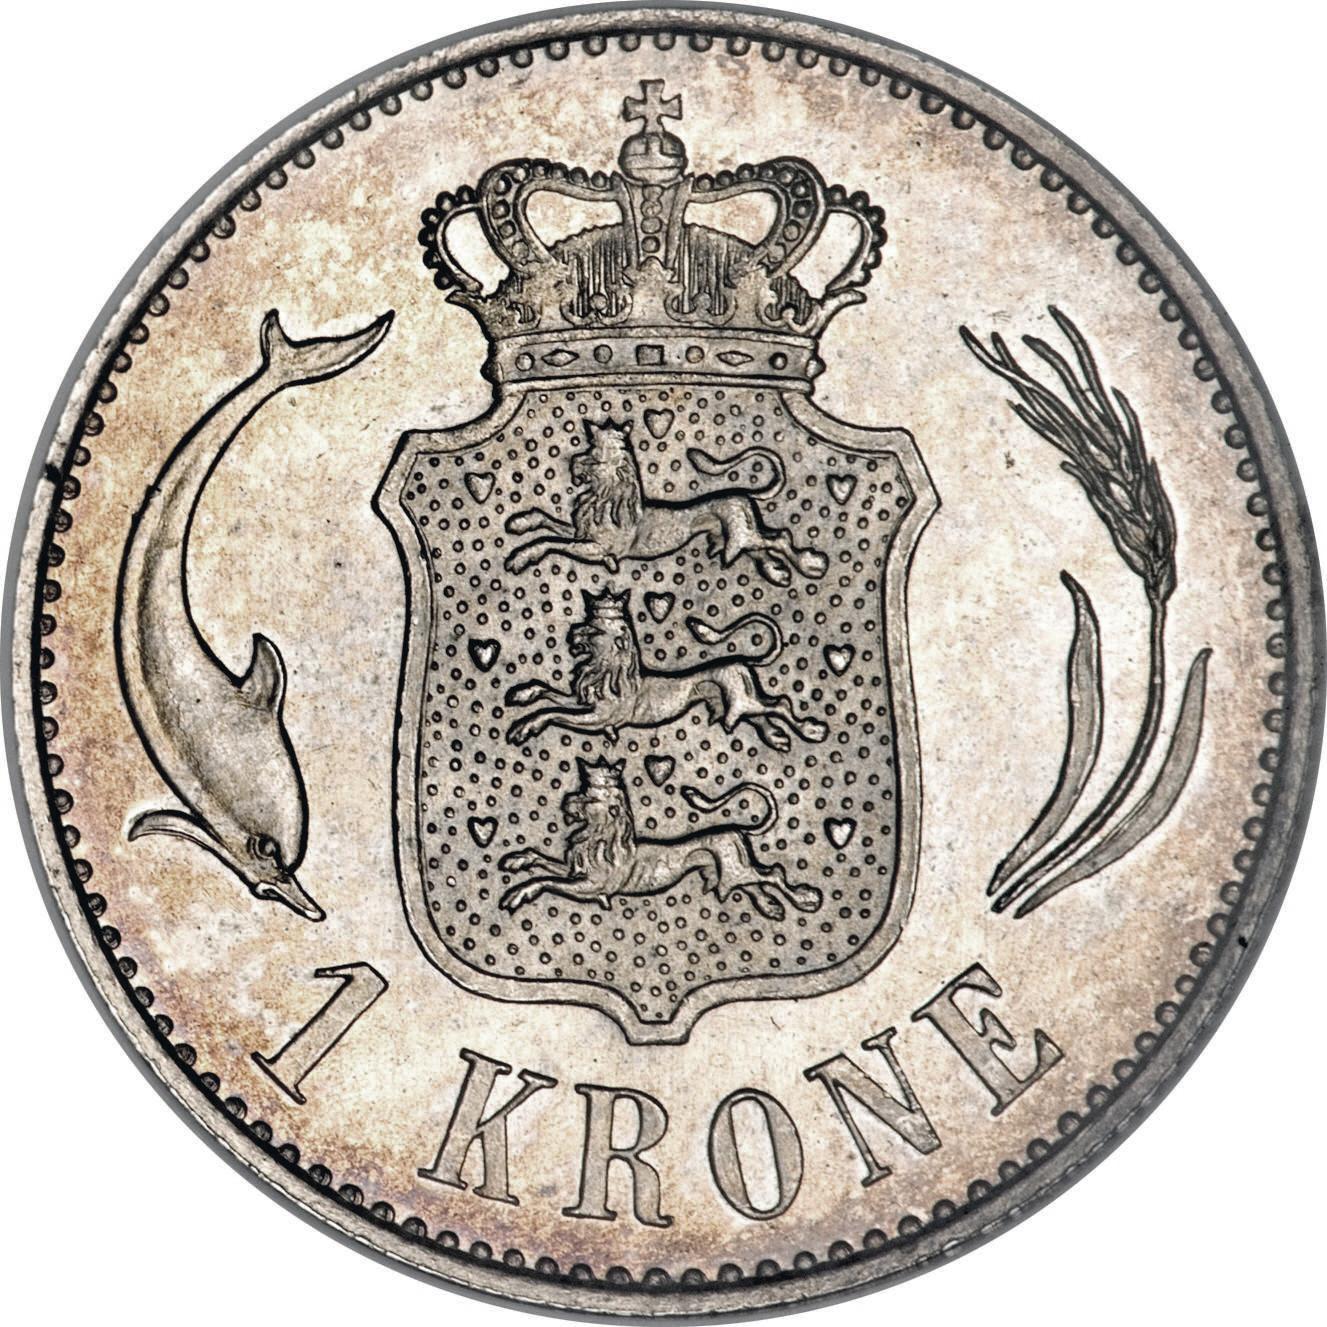 Denmark World Coins